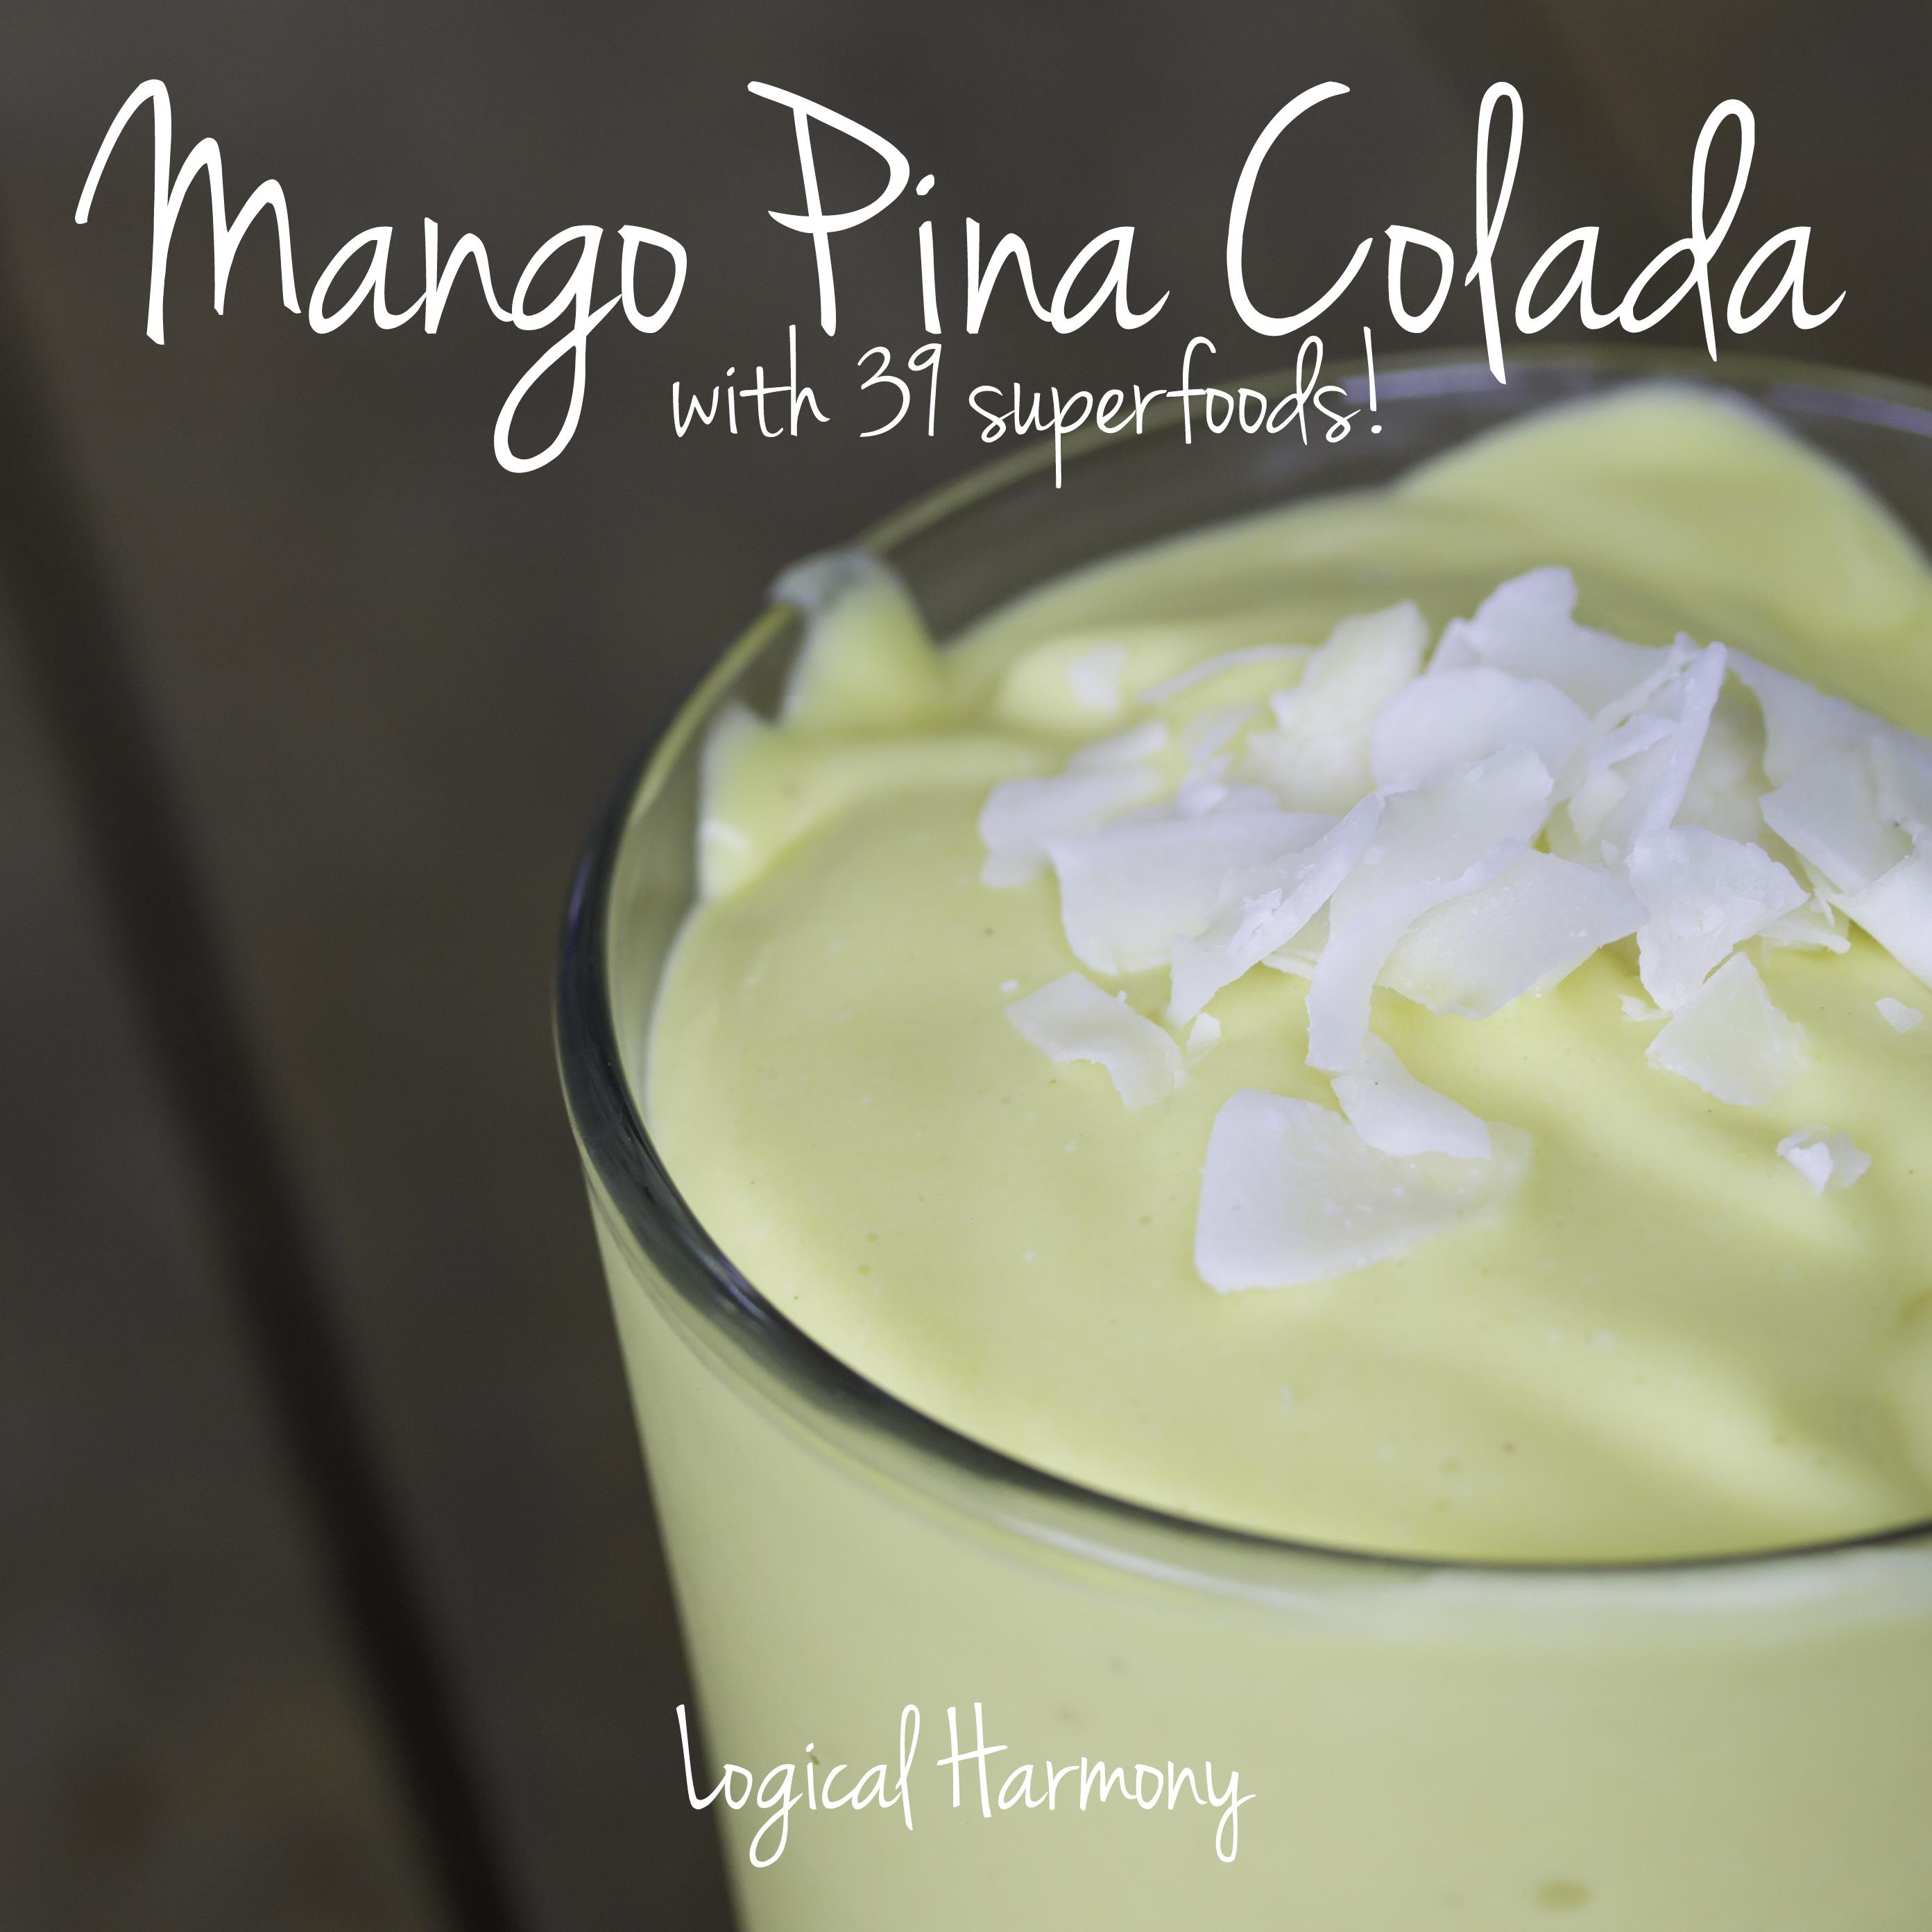 Vegan Mango Piña Colada Smoothie (with 39 Superfoods!)